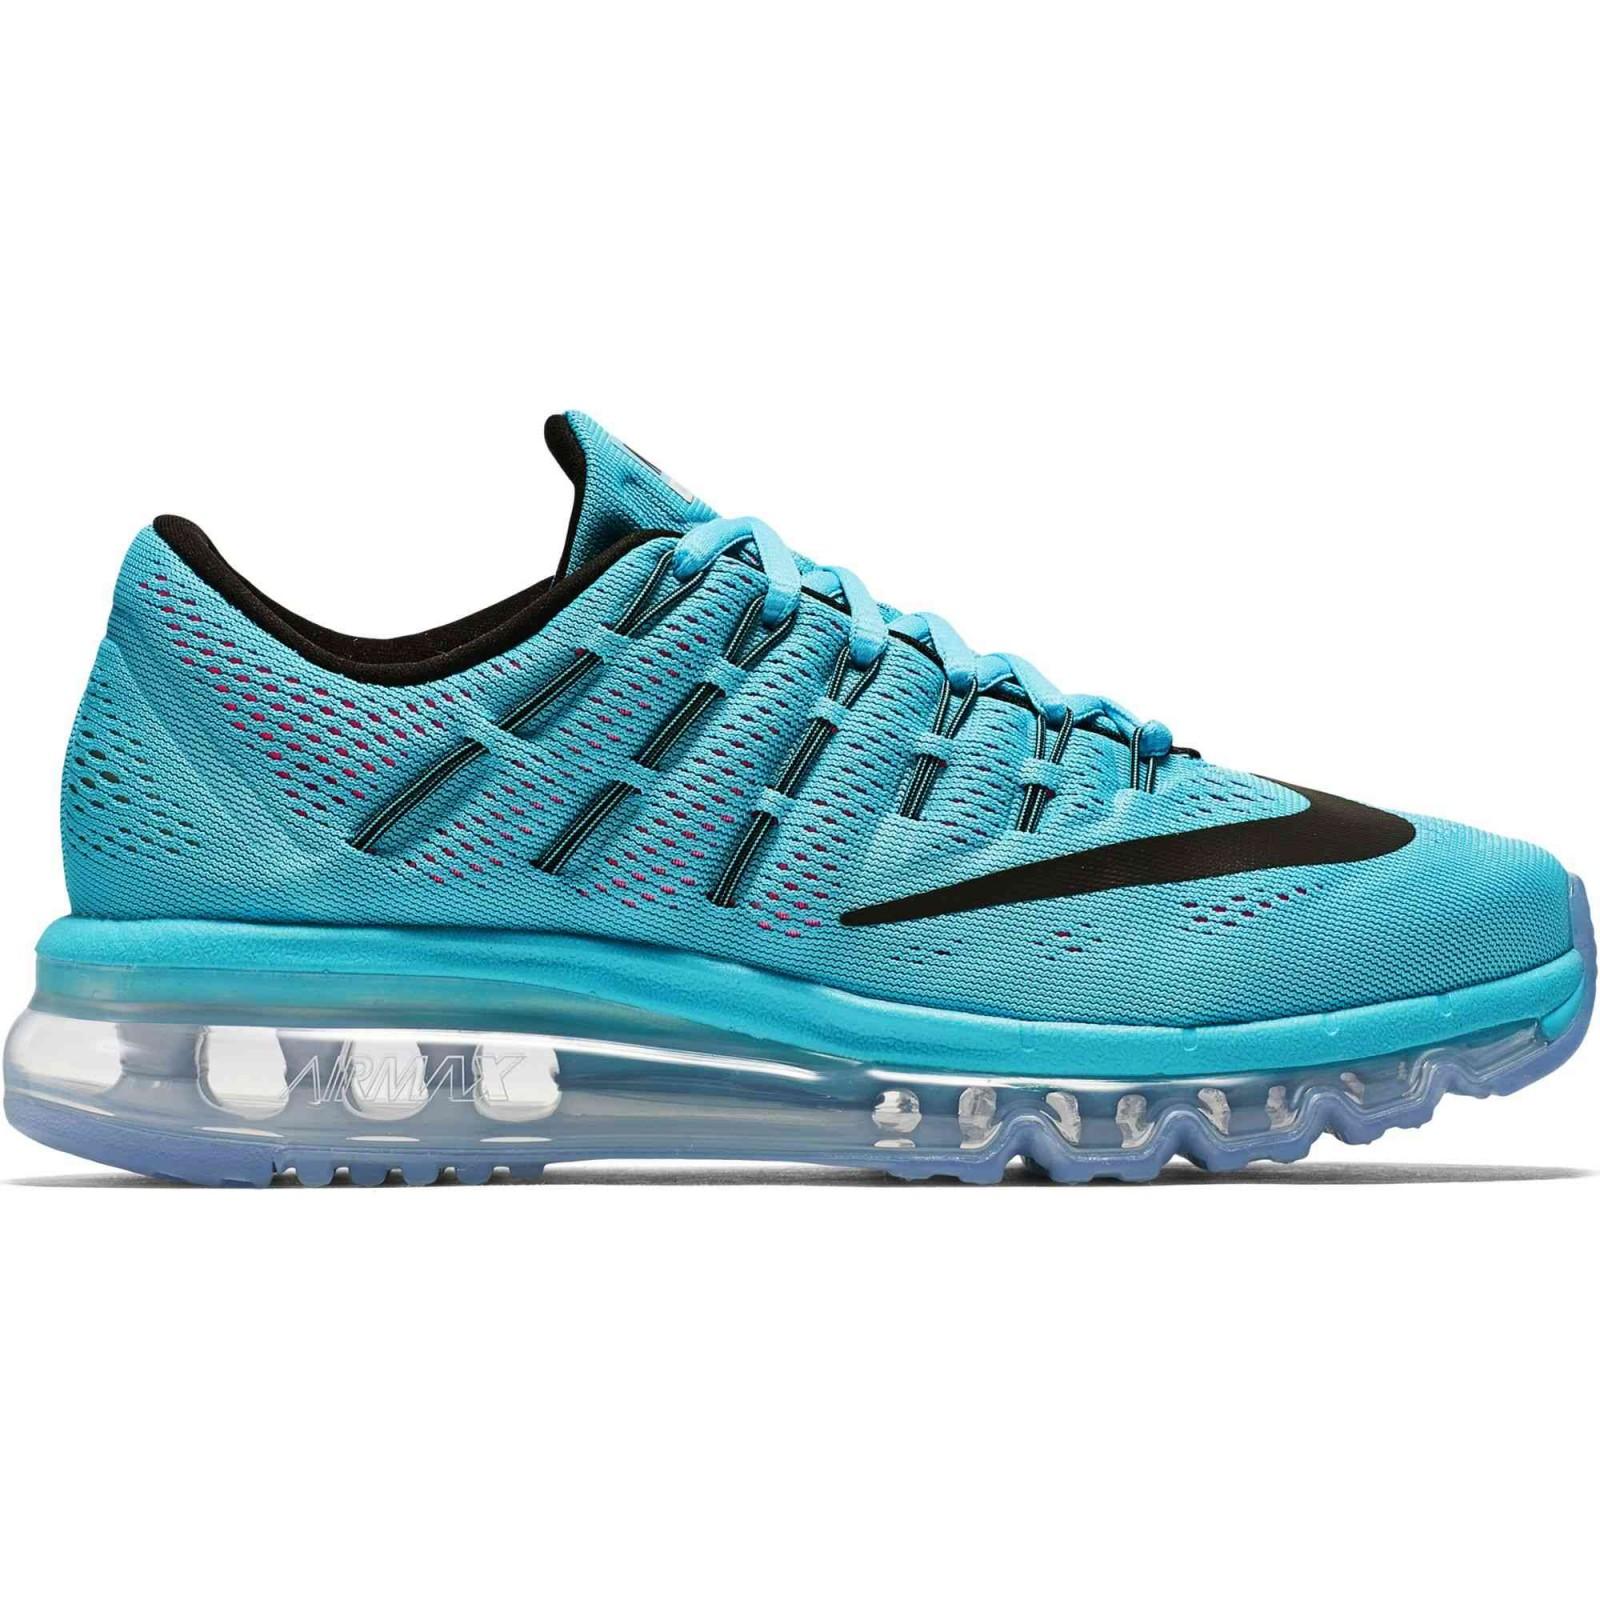 Dámské boty Nike WMNS AIR MAX 2016 tyrkysové  61c6dfa9dd